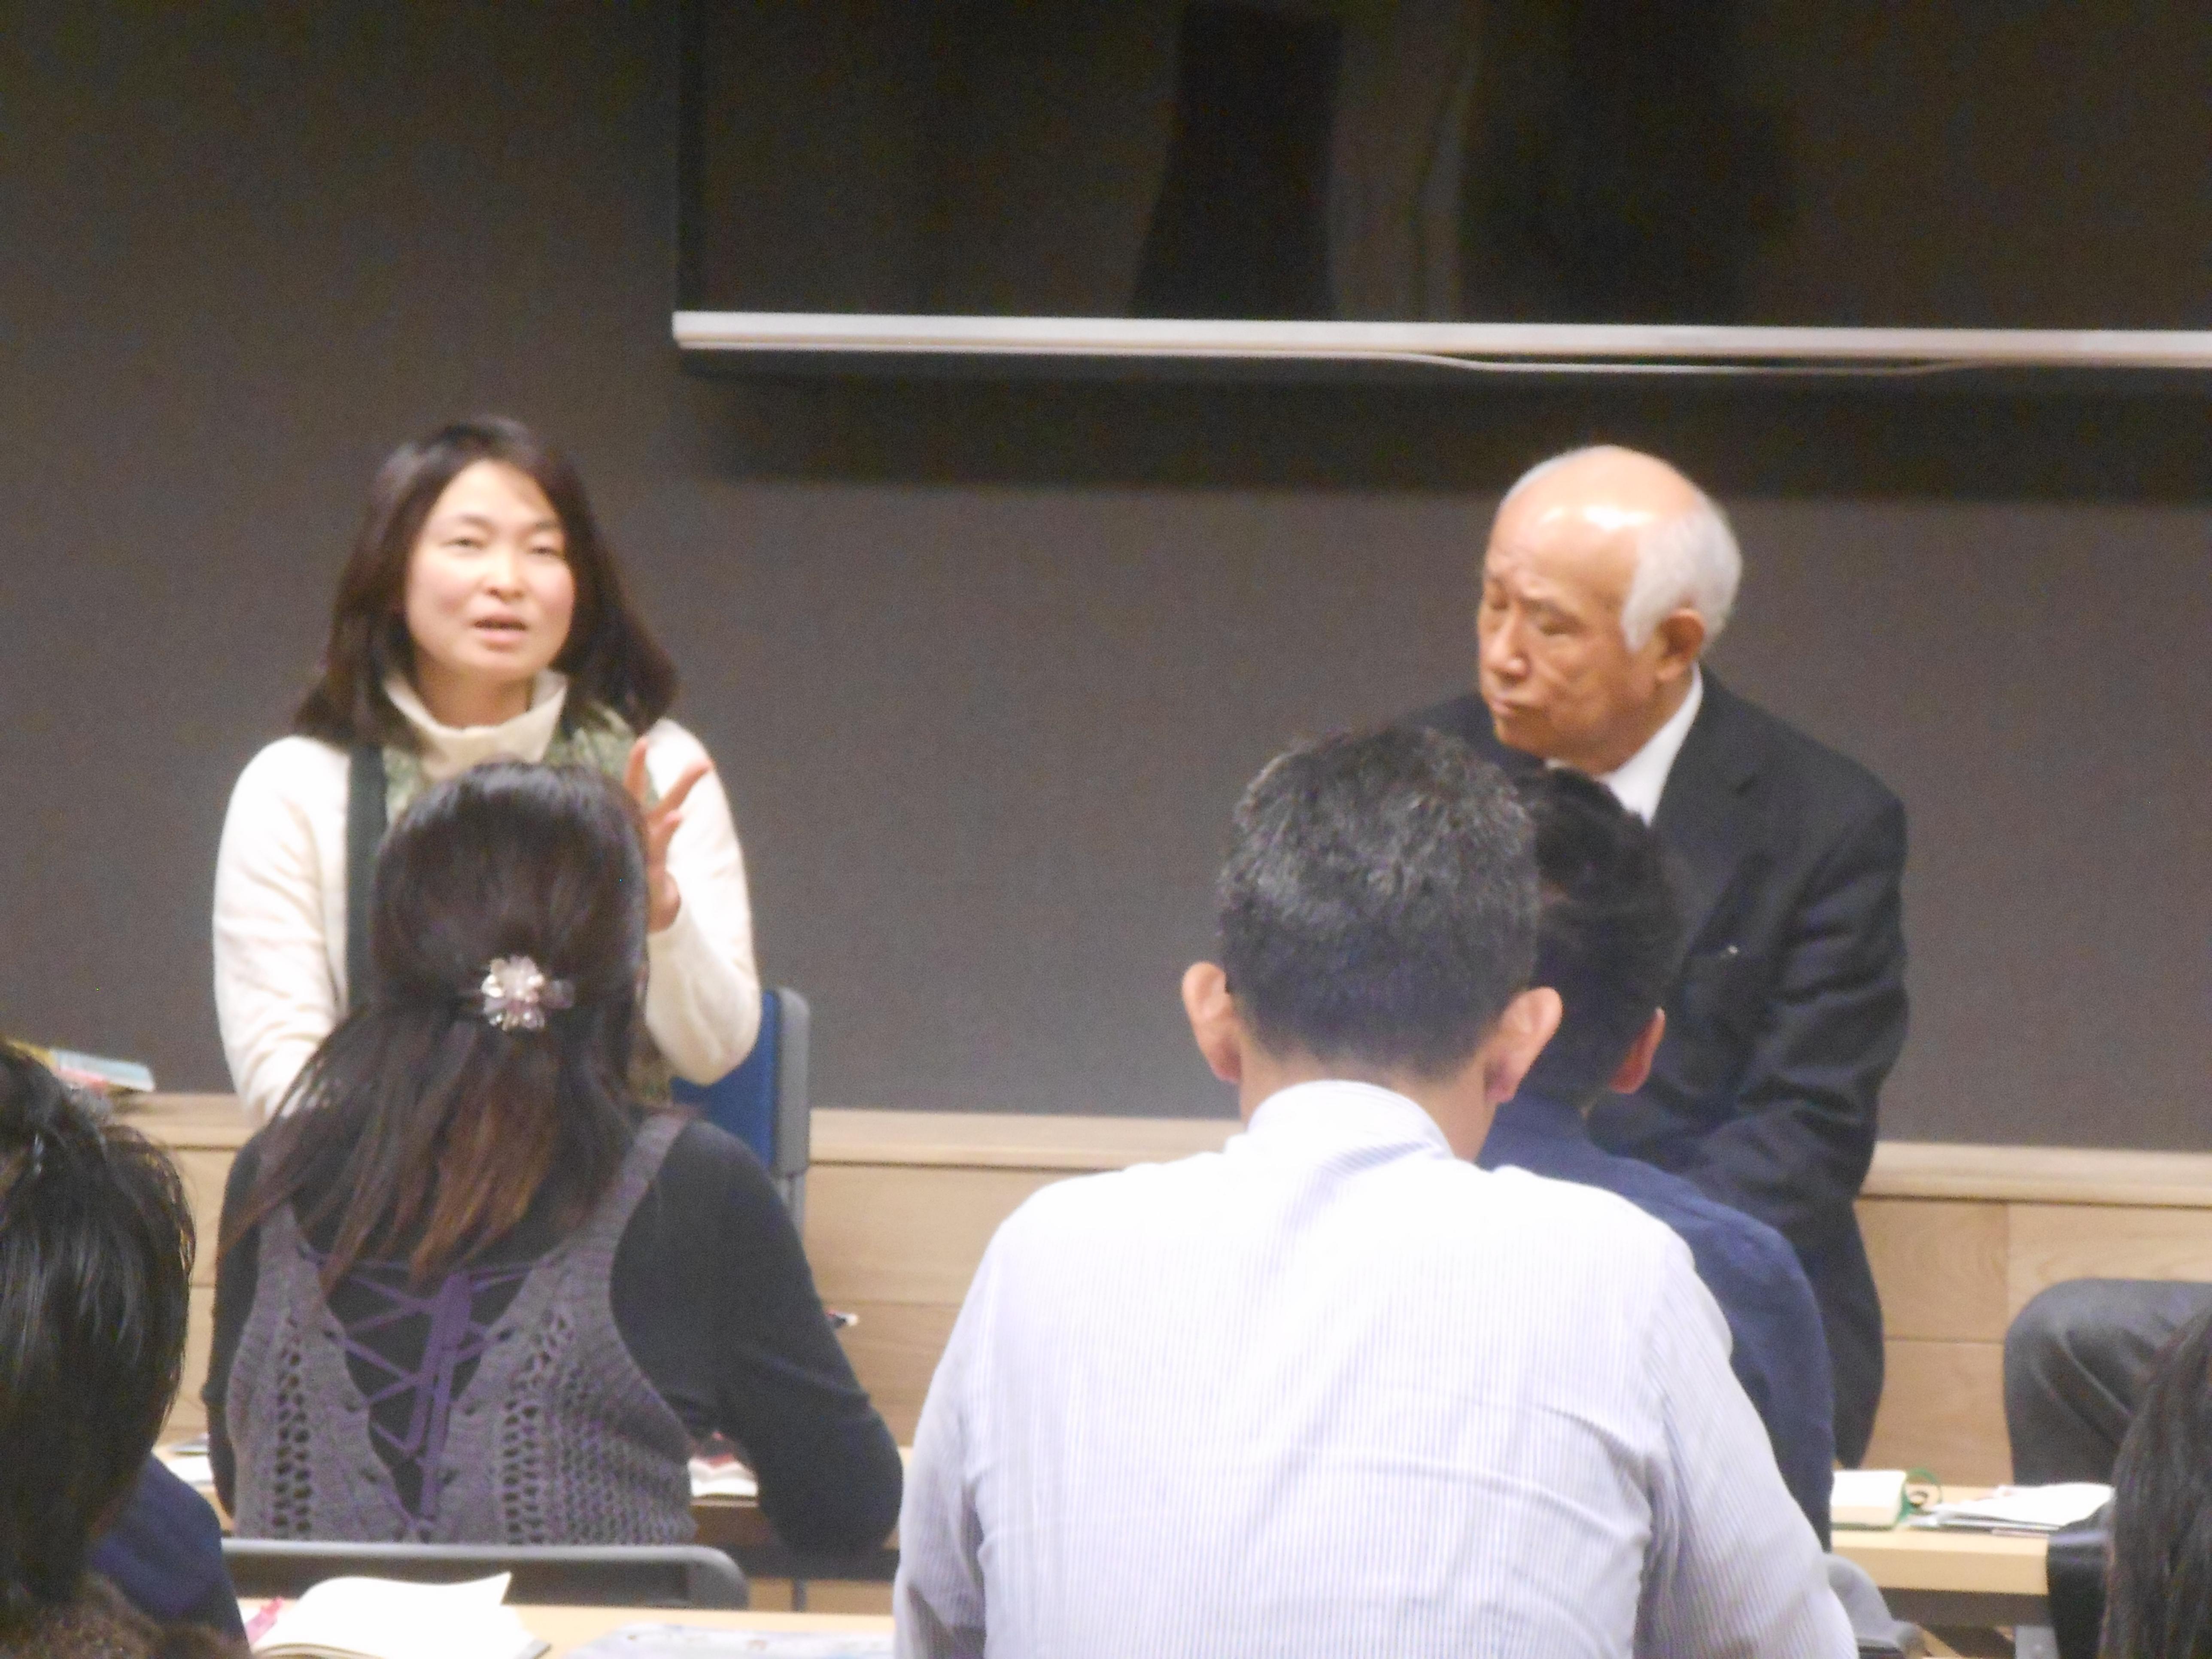 DSCN0482 - 2017年2月4日東京思風塾開催